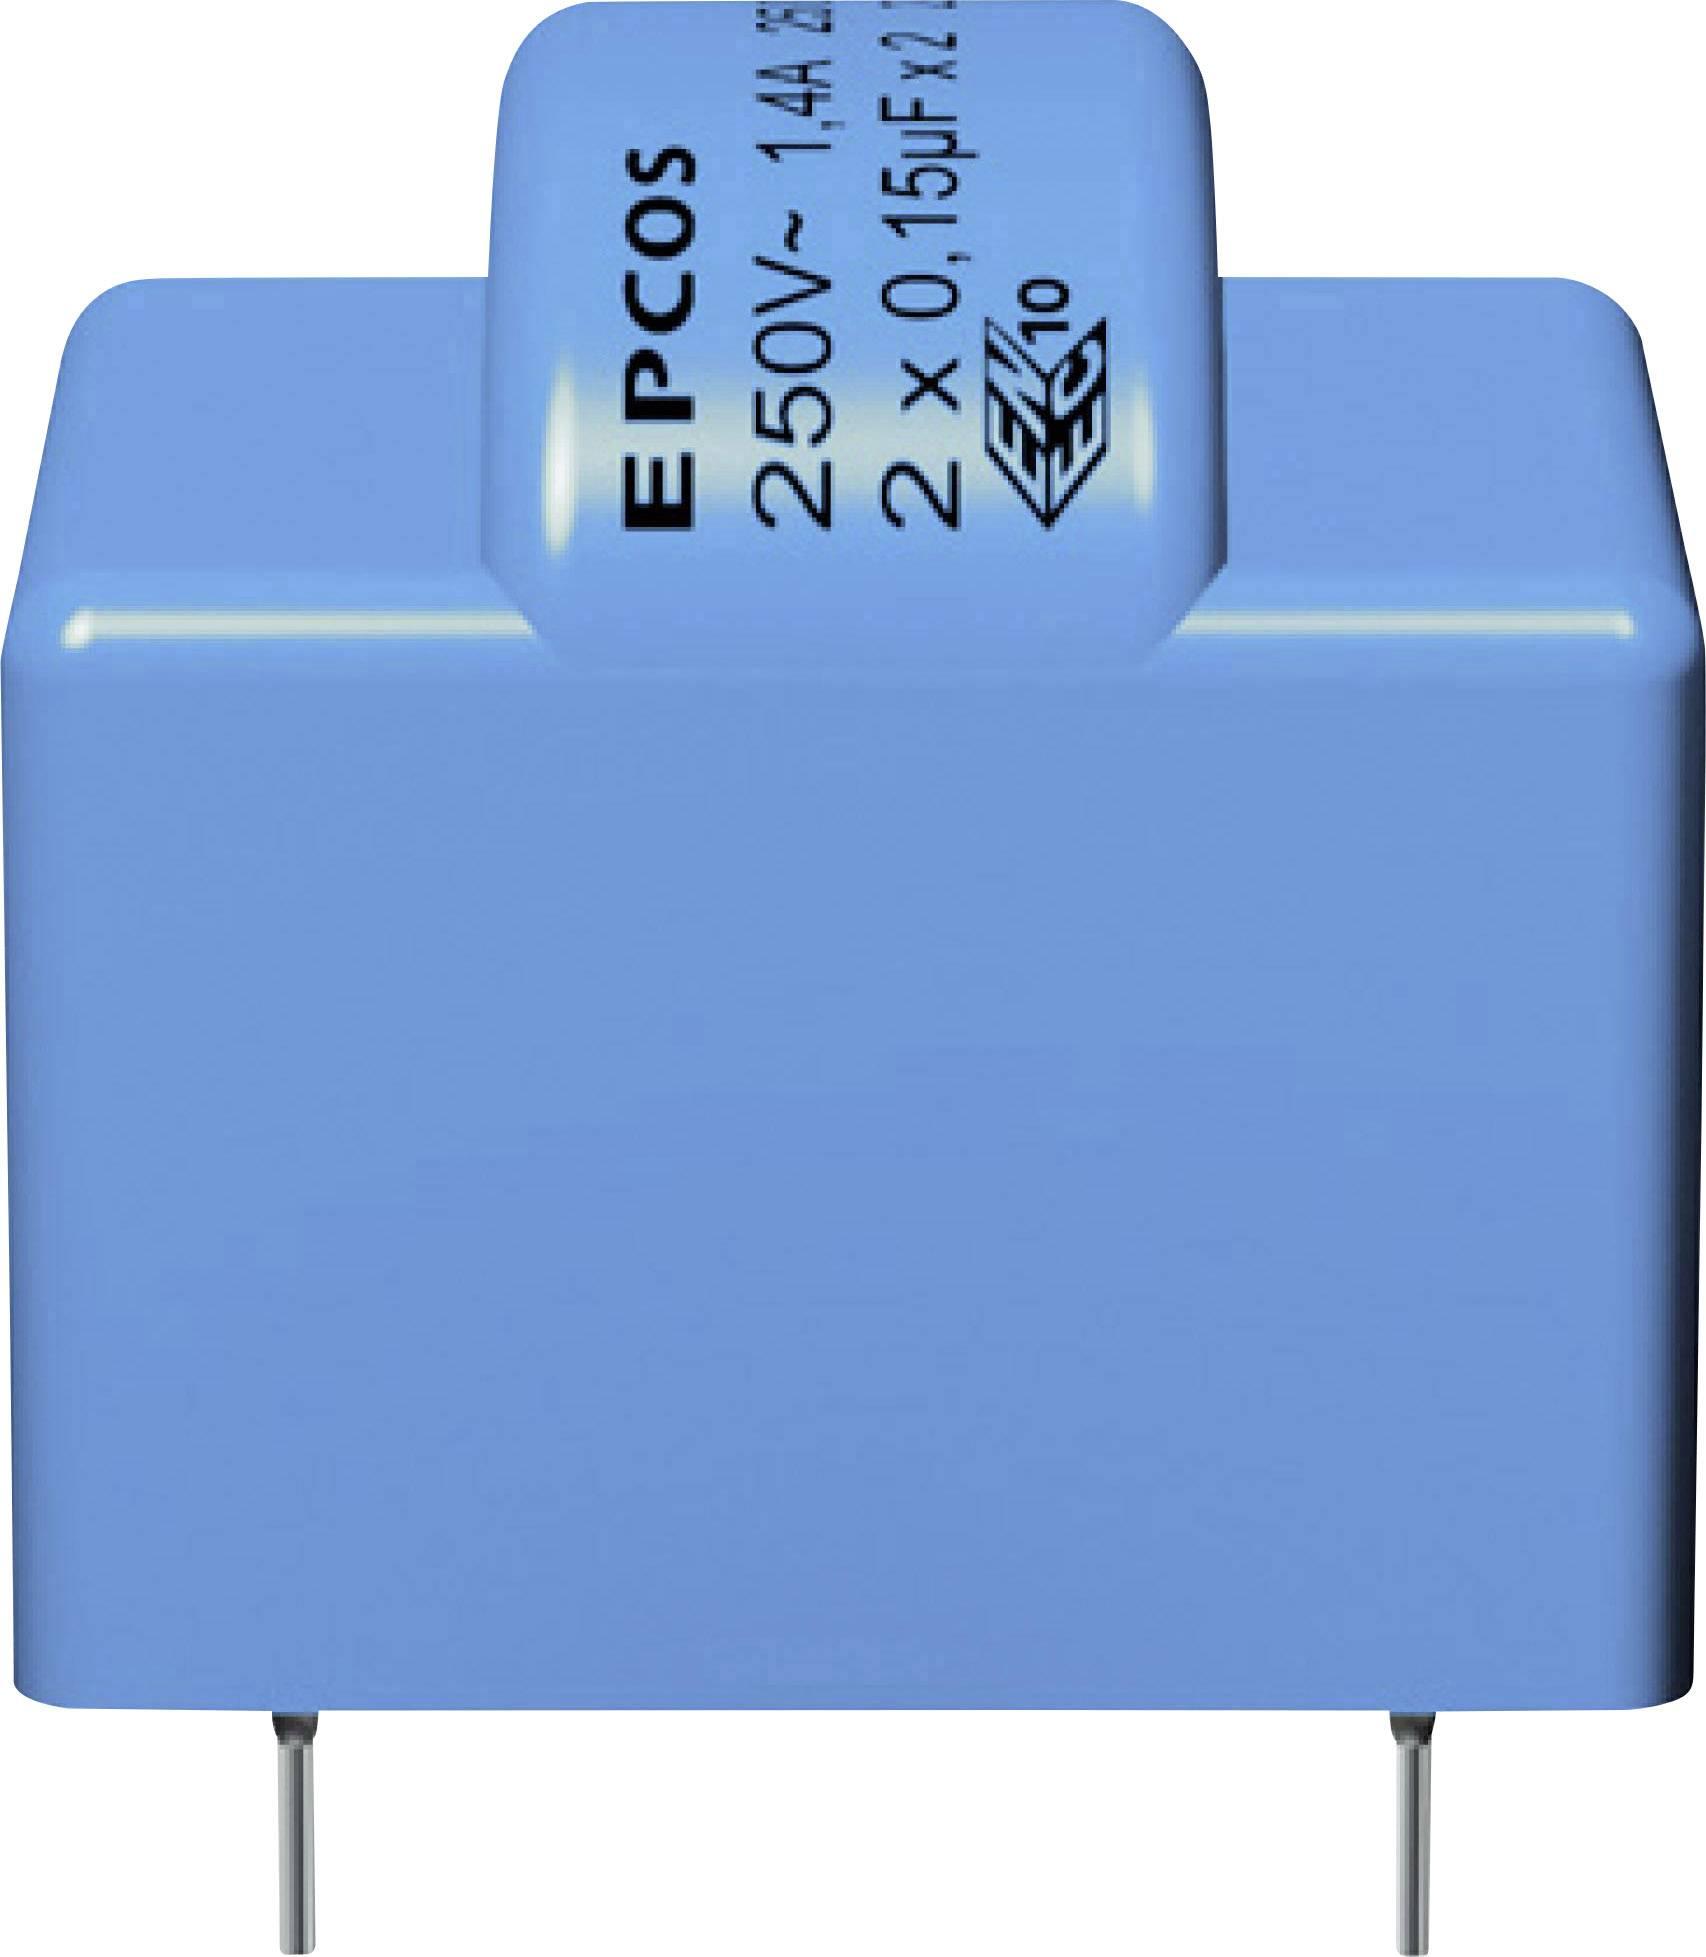 Odrušovací filter Epcos B84110B0000A014 B84110B0000A014, 250 V/AC, 1.4 A, 27 mH, (d x š x v) 34 x 31 x 33 mm, 1 ks